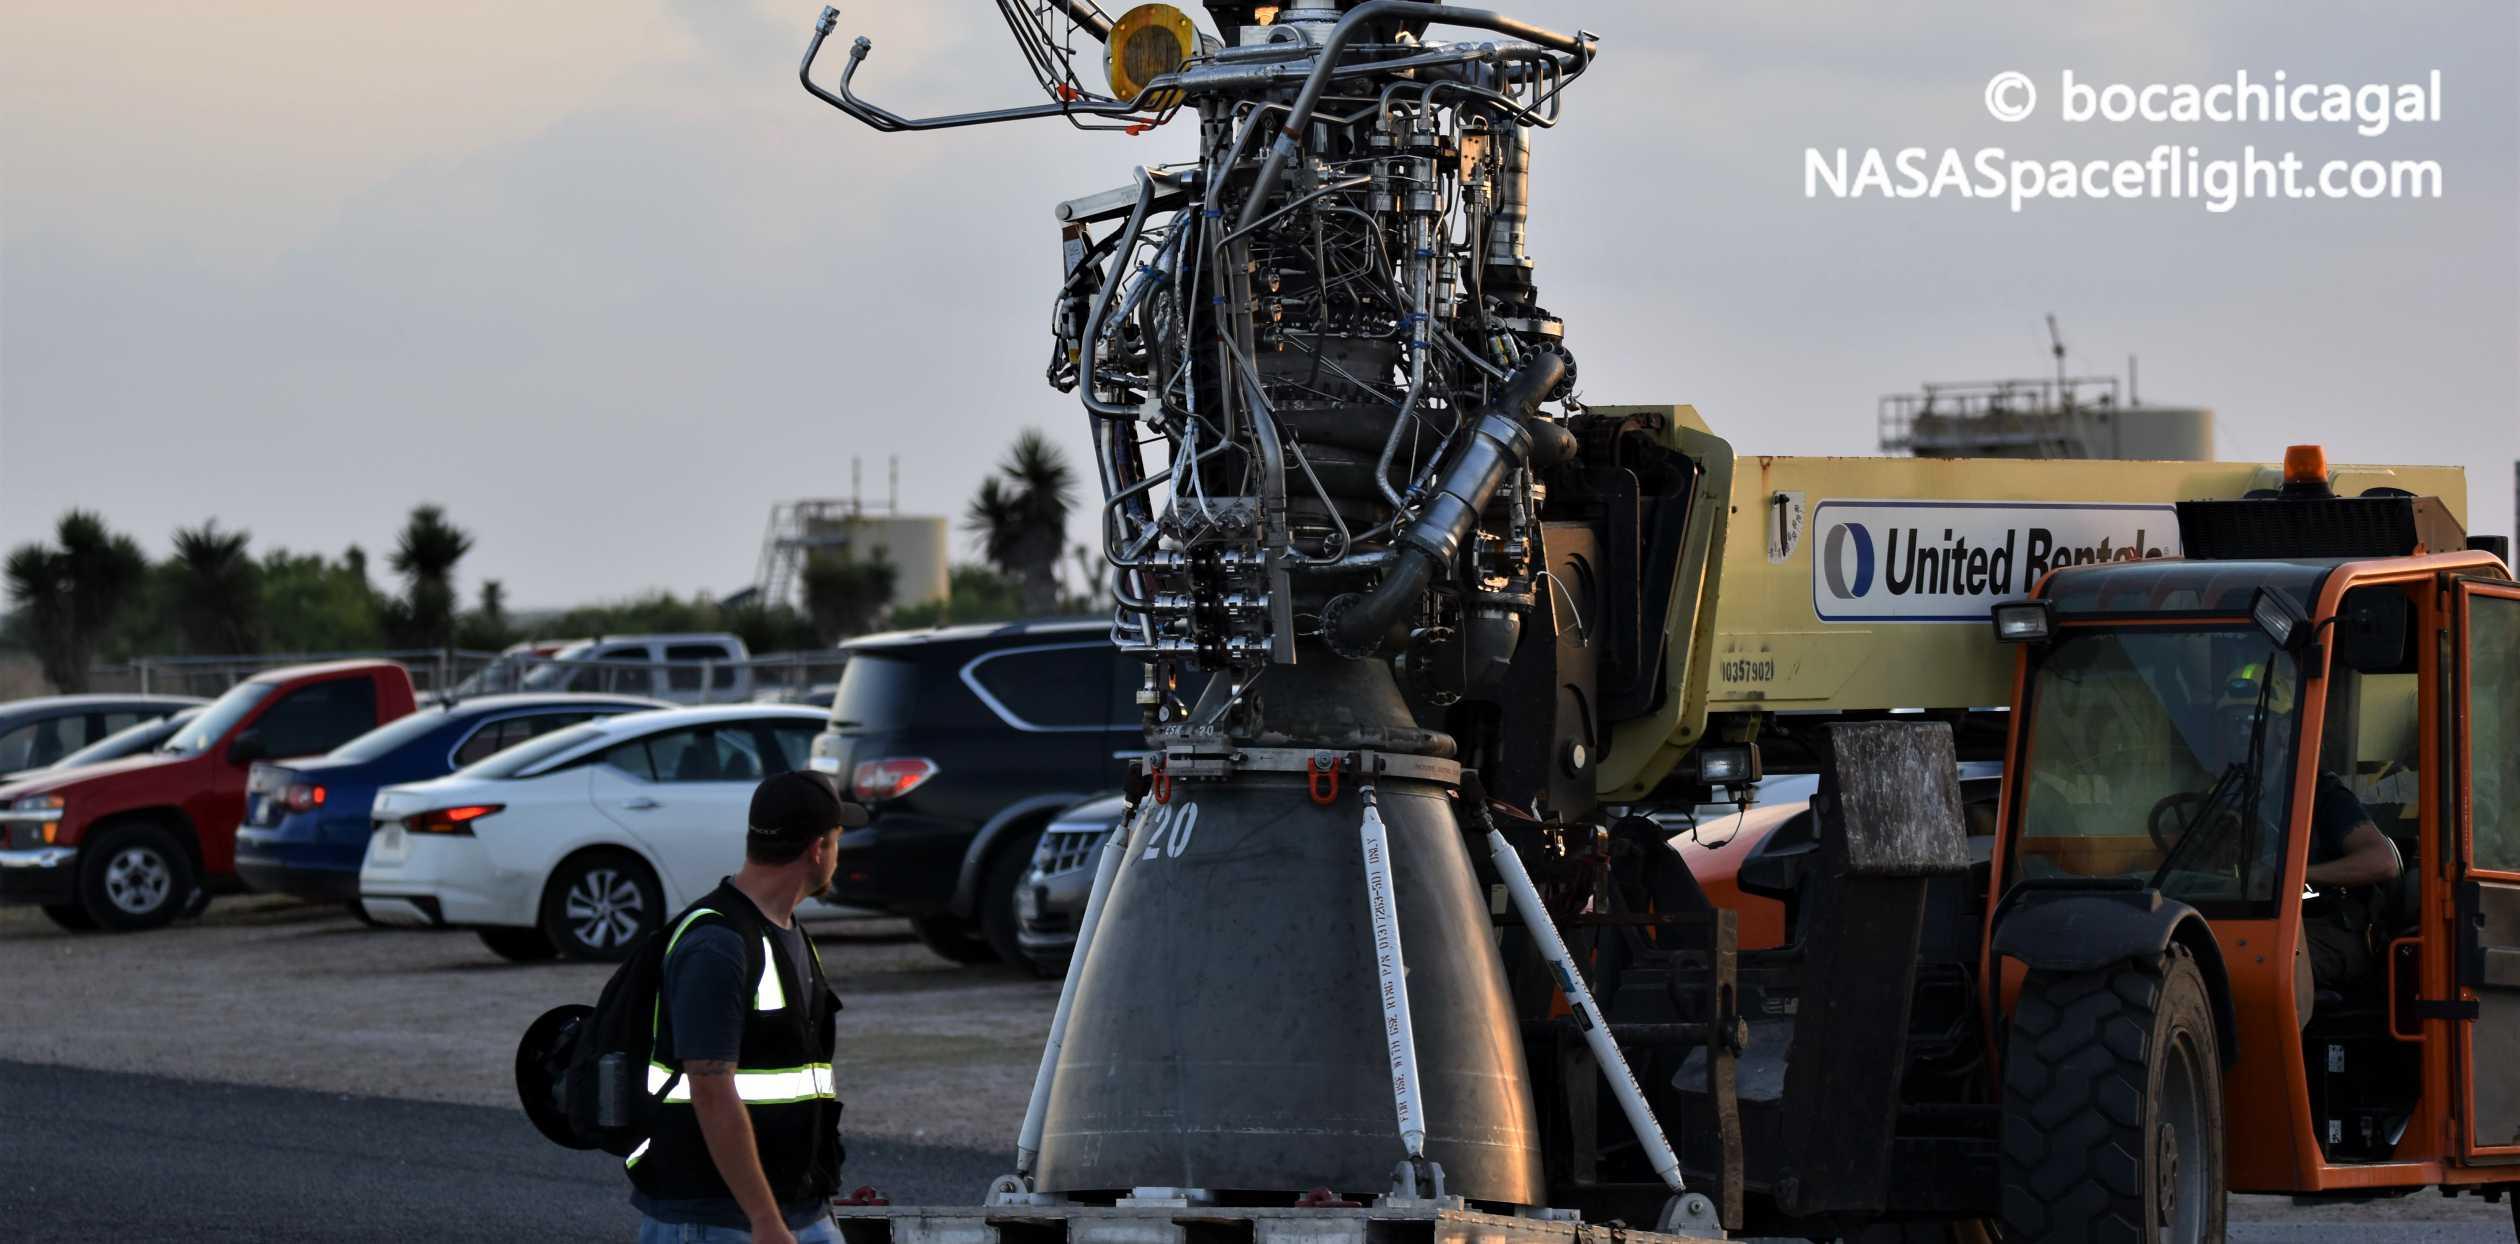 Starship Boca Chica 051020 (NASASpaceflight – bocachicagal) SN4 Raptor SN20 delivery 2 crop (c)